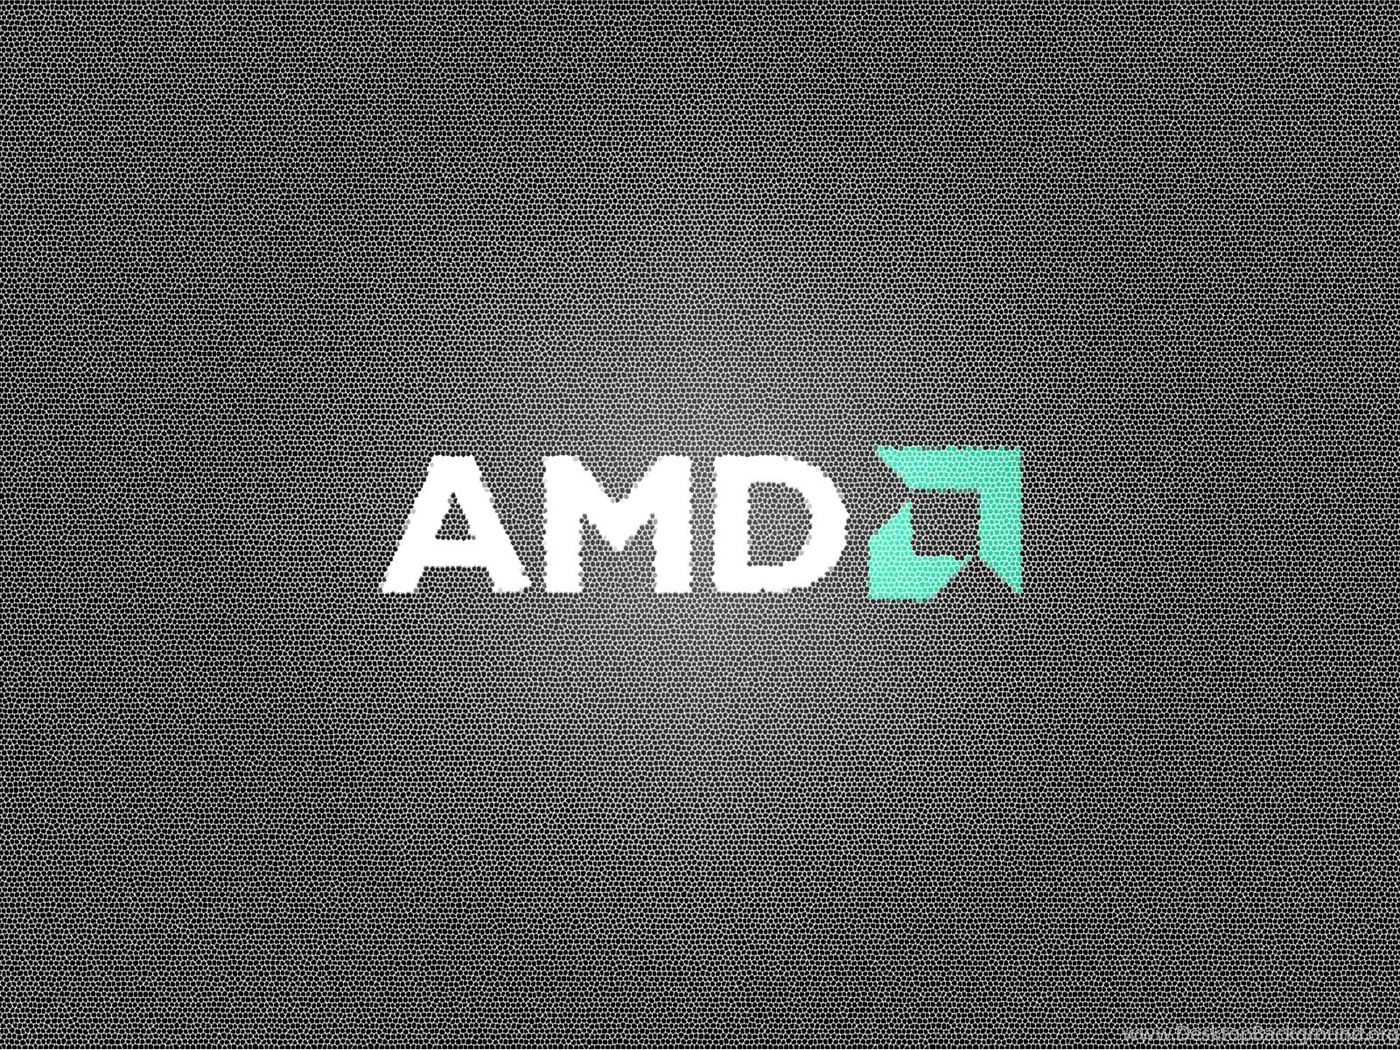 Amd Wallpapers Free Full Hd Wallpaper Widescreen Hq Desktop Desktop Background